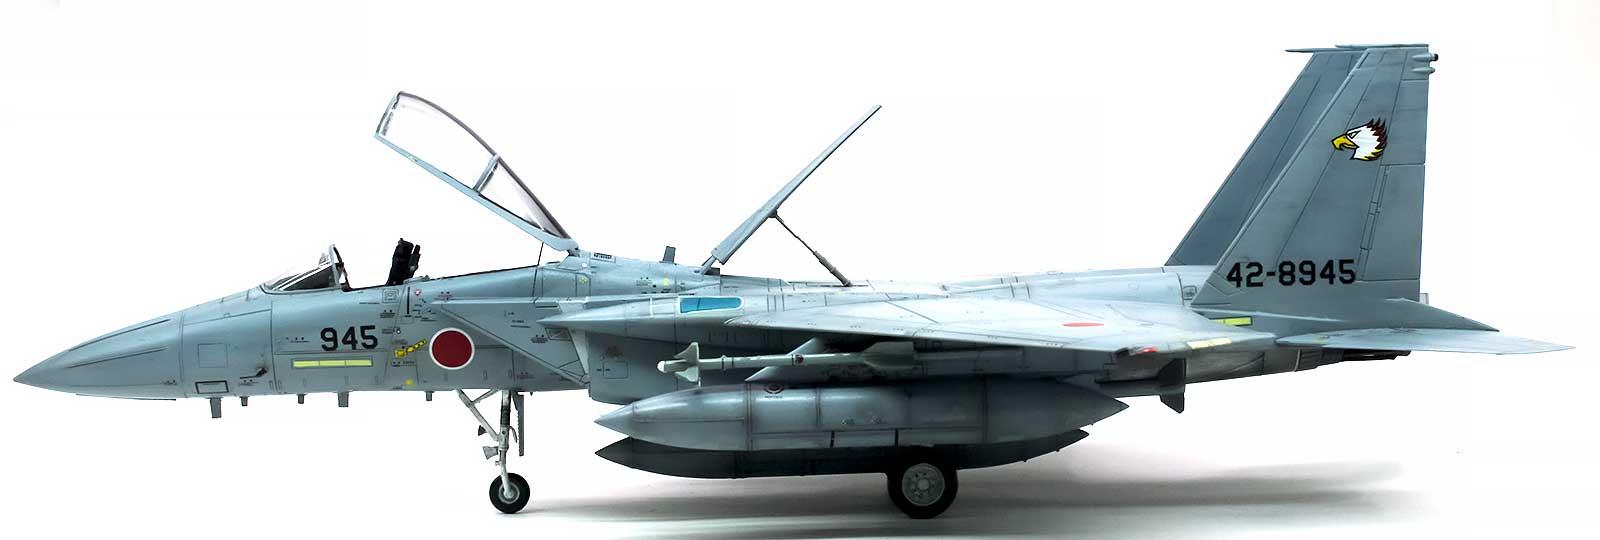 F 15 (戦闘機)の画像 p1_29